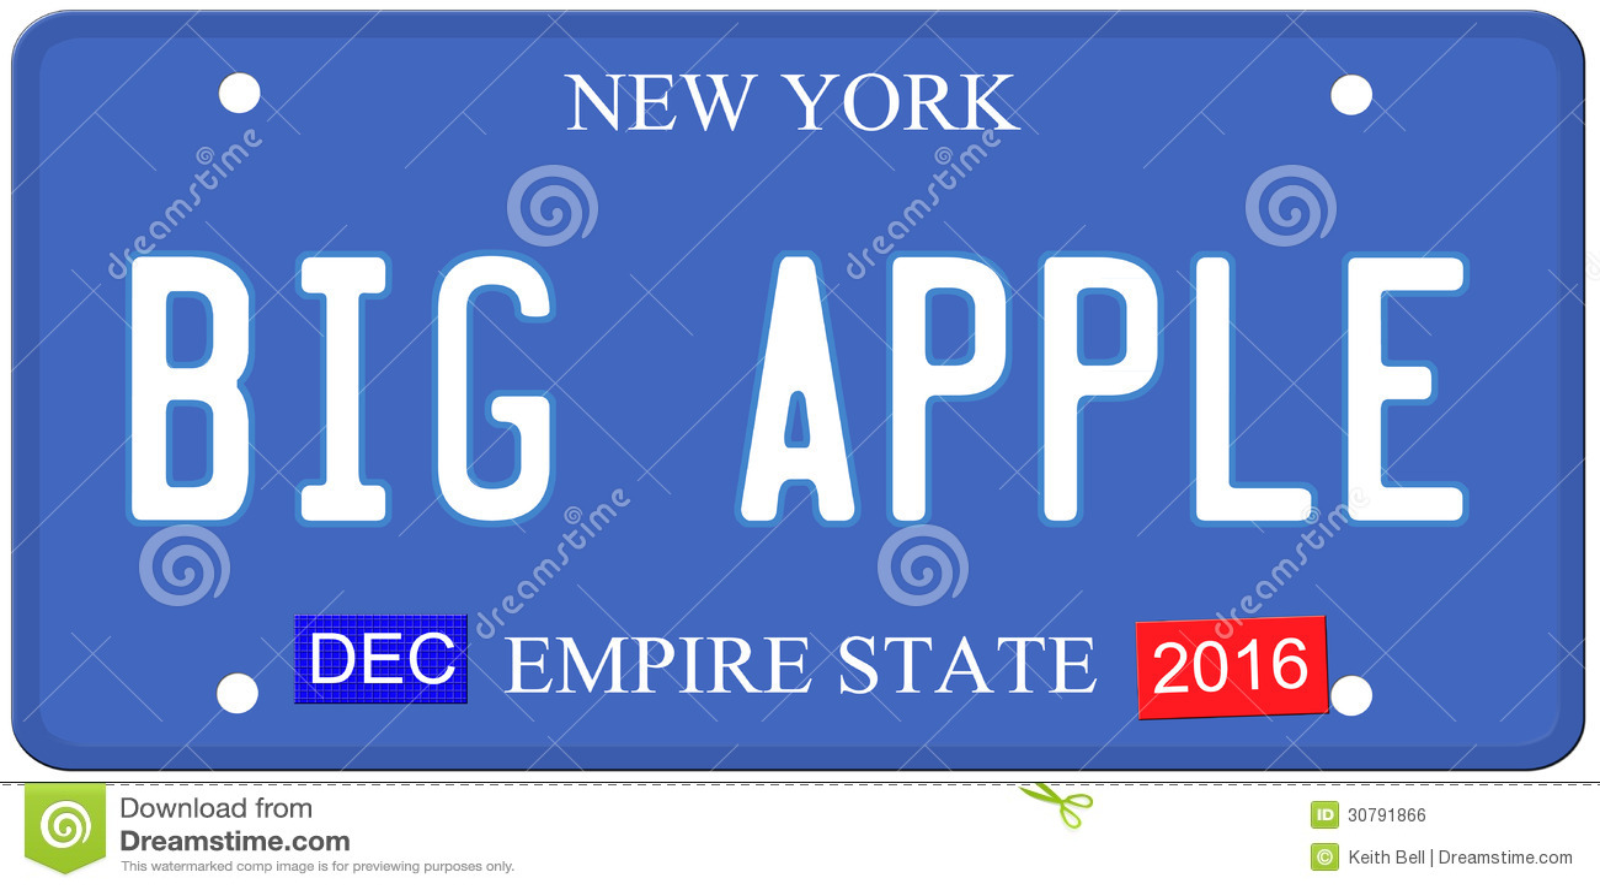 Big apple new york license plate stock illustration illustration big apple new york license plate publicscrutiny Choice Image